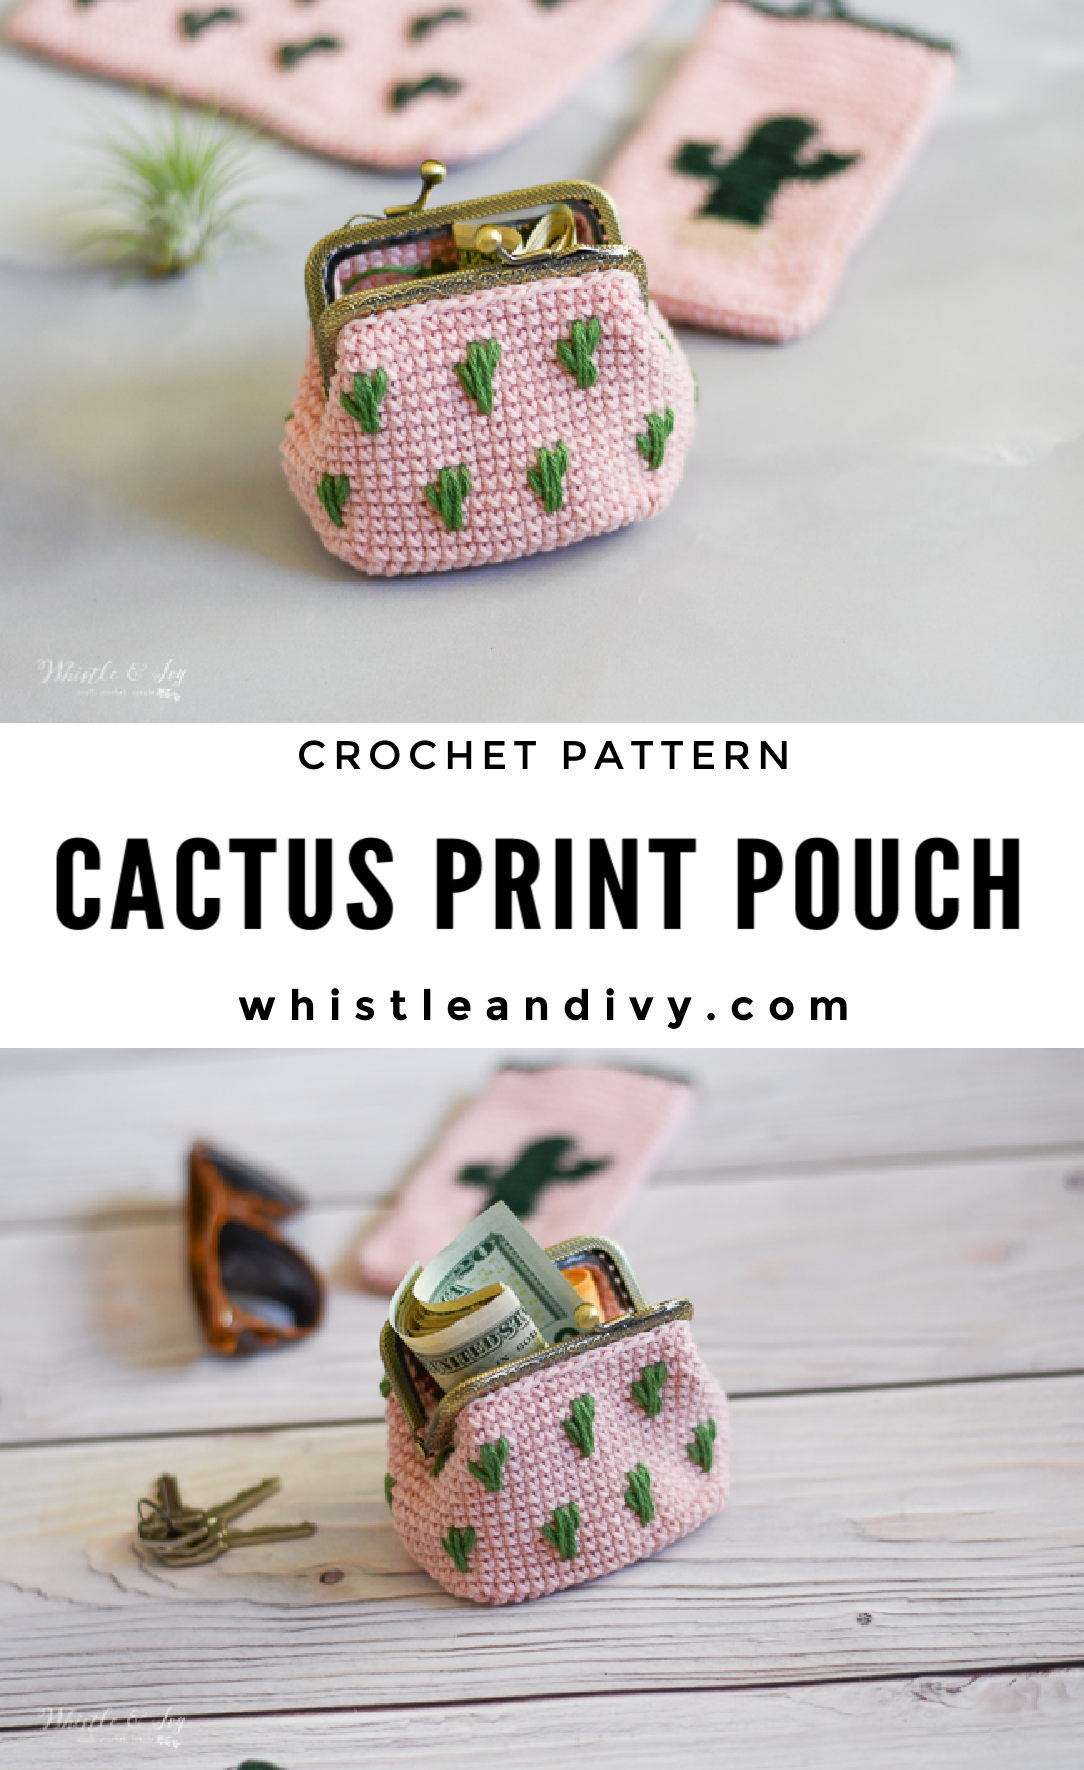 crochet cactus clutch pouch coin purse coin pouch crochet pattern